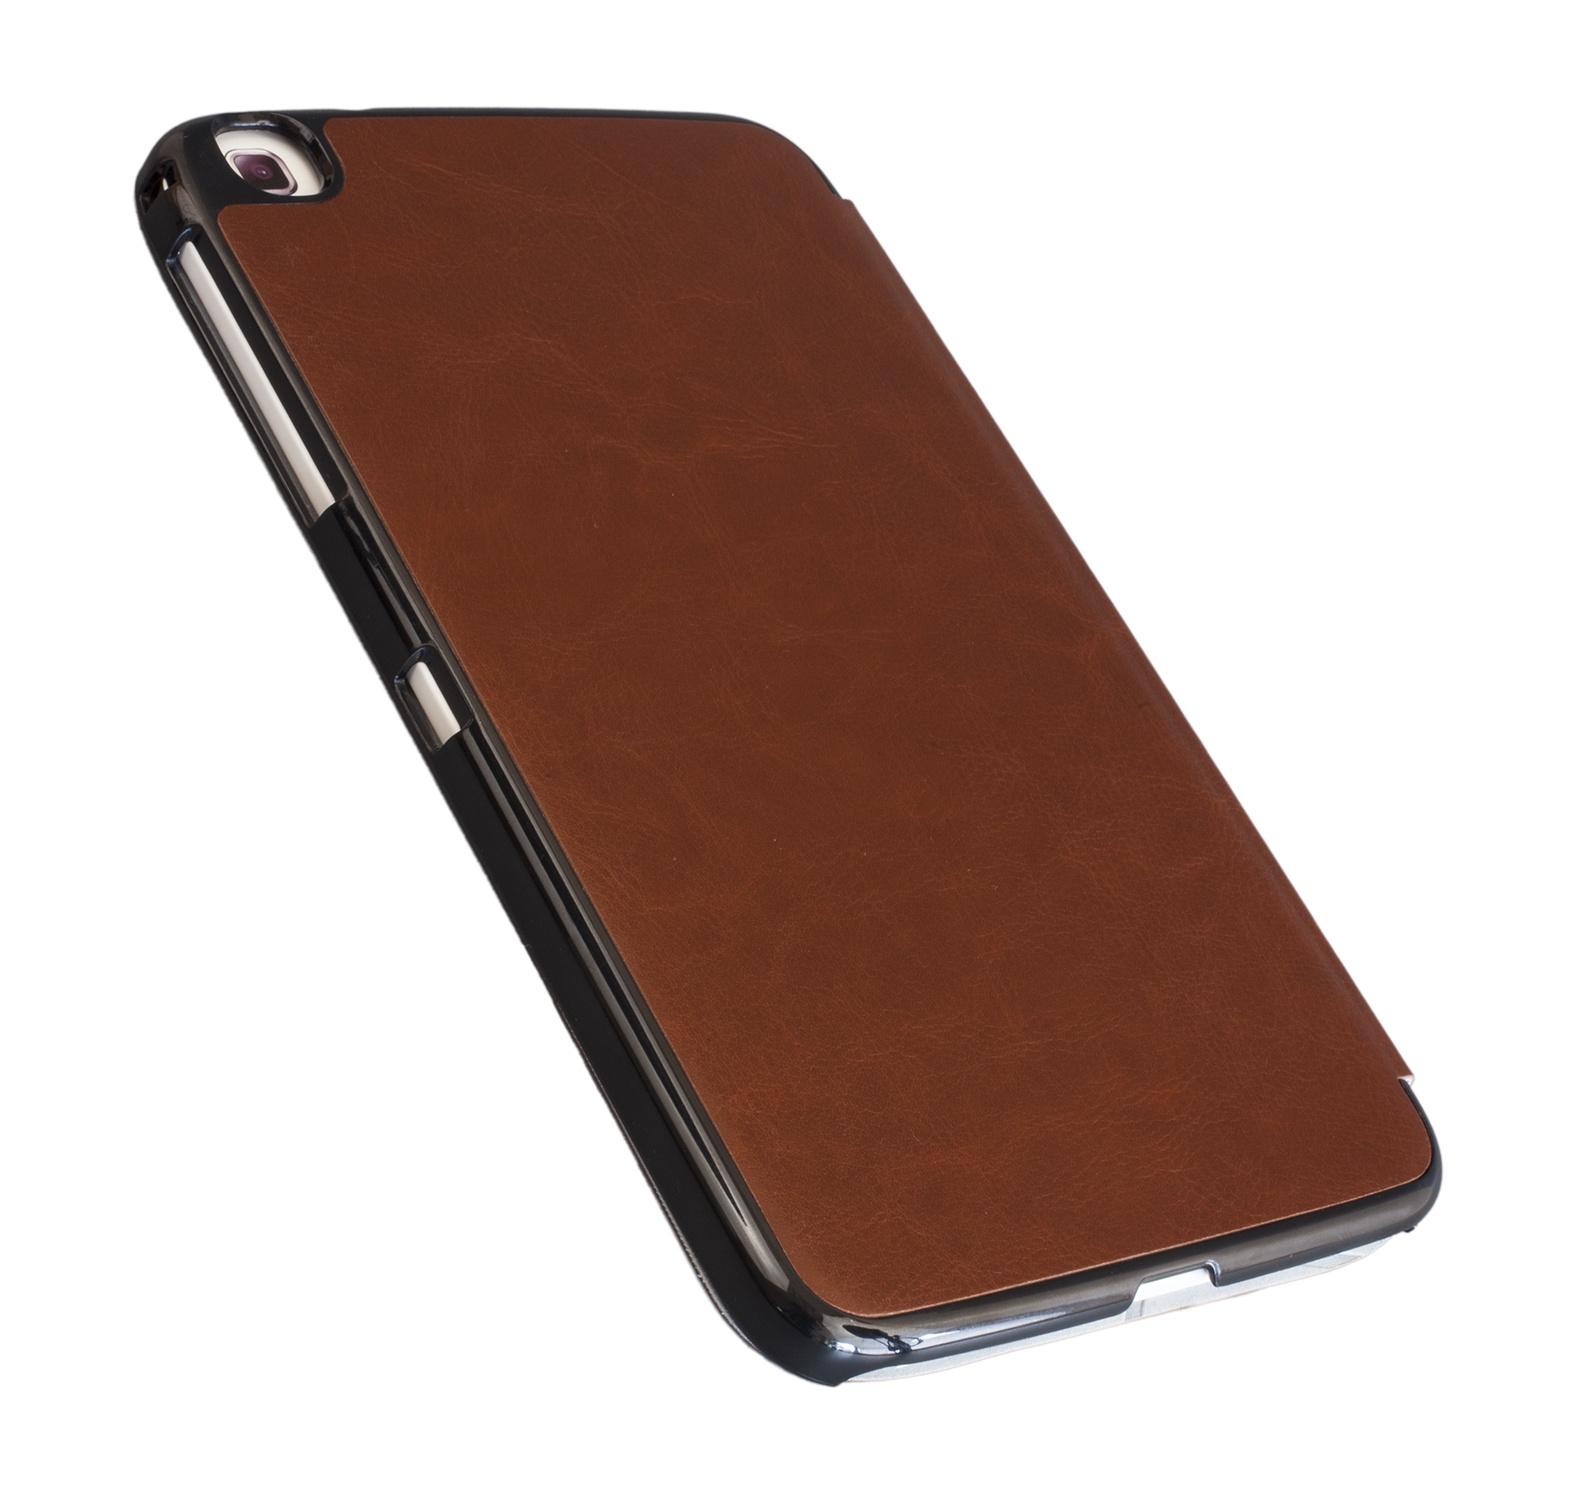 Чехол для планшета TUTTI FRUTTI GALAXY TAB 3 8.0, коричневый цены